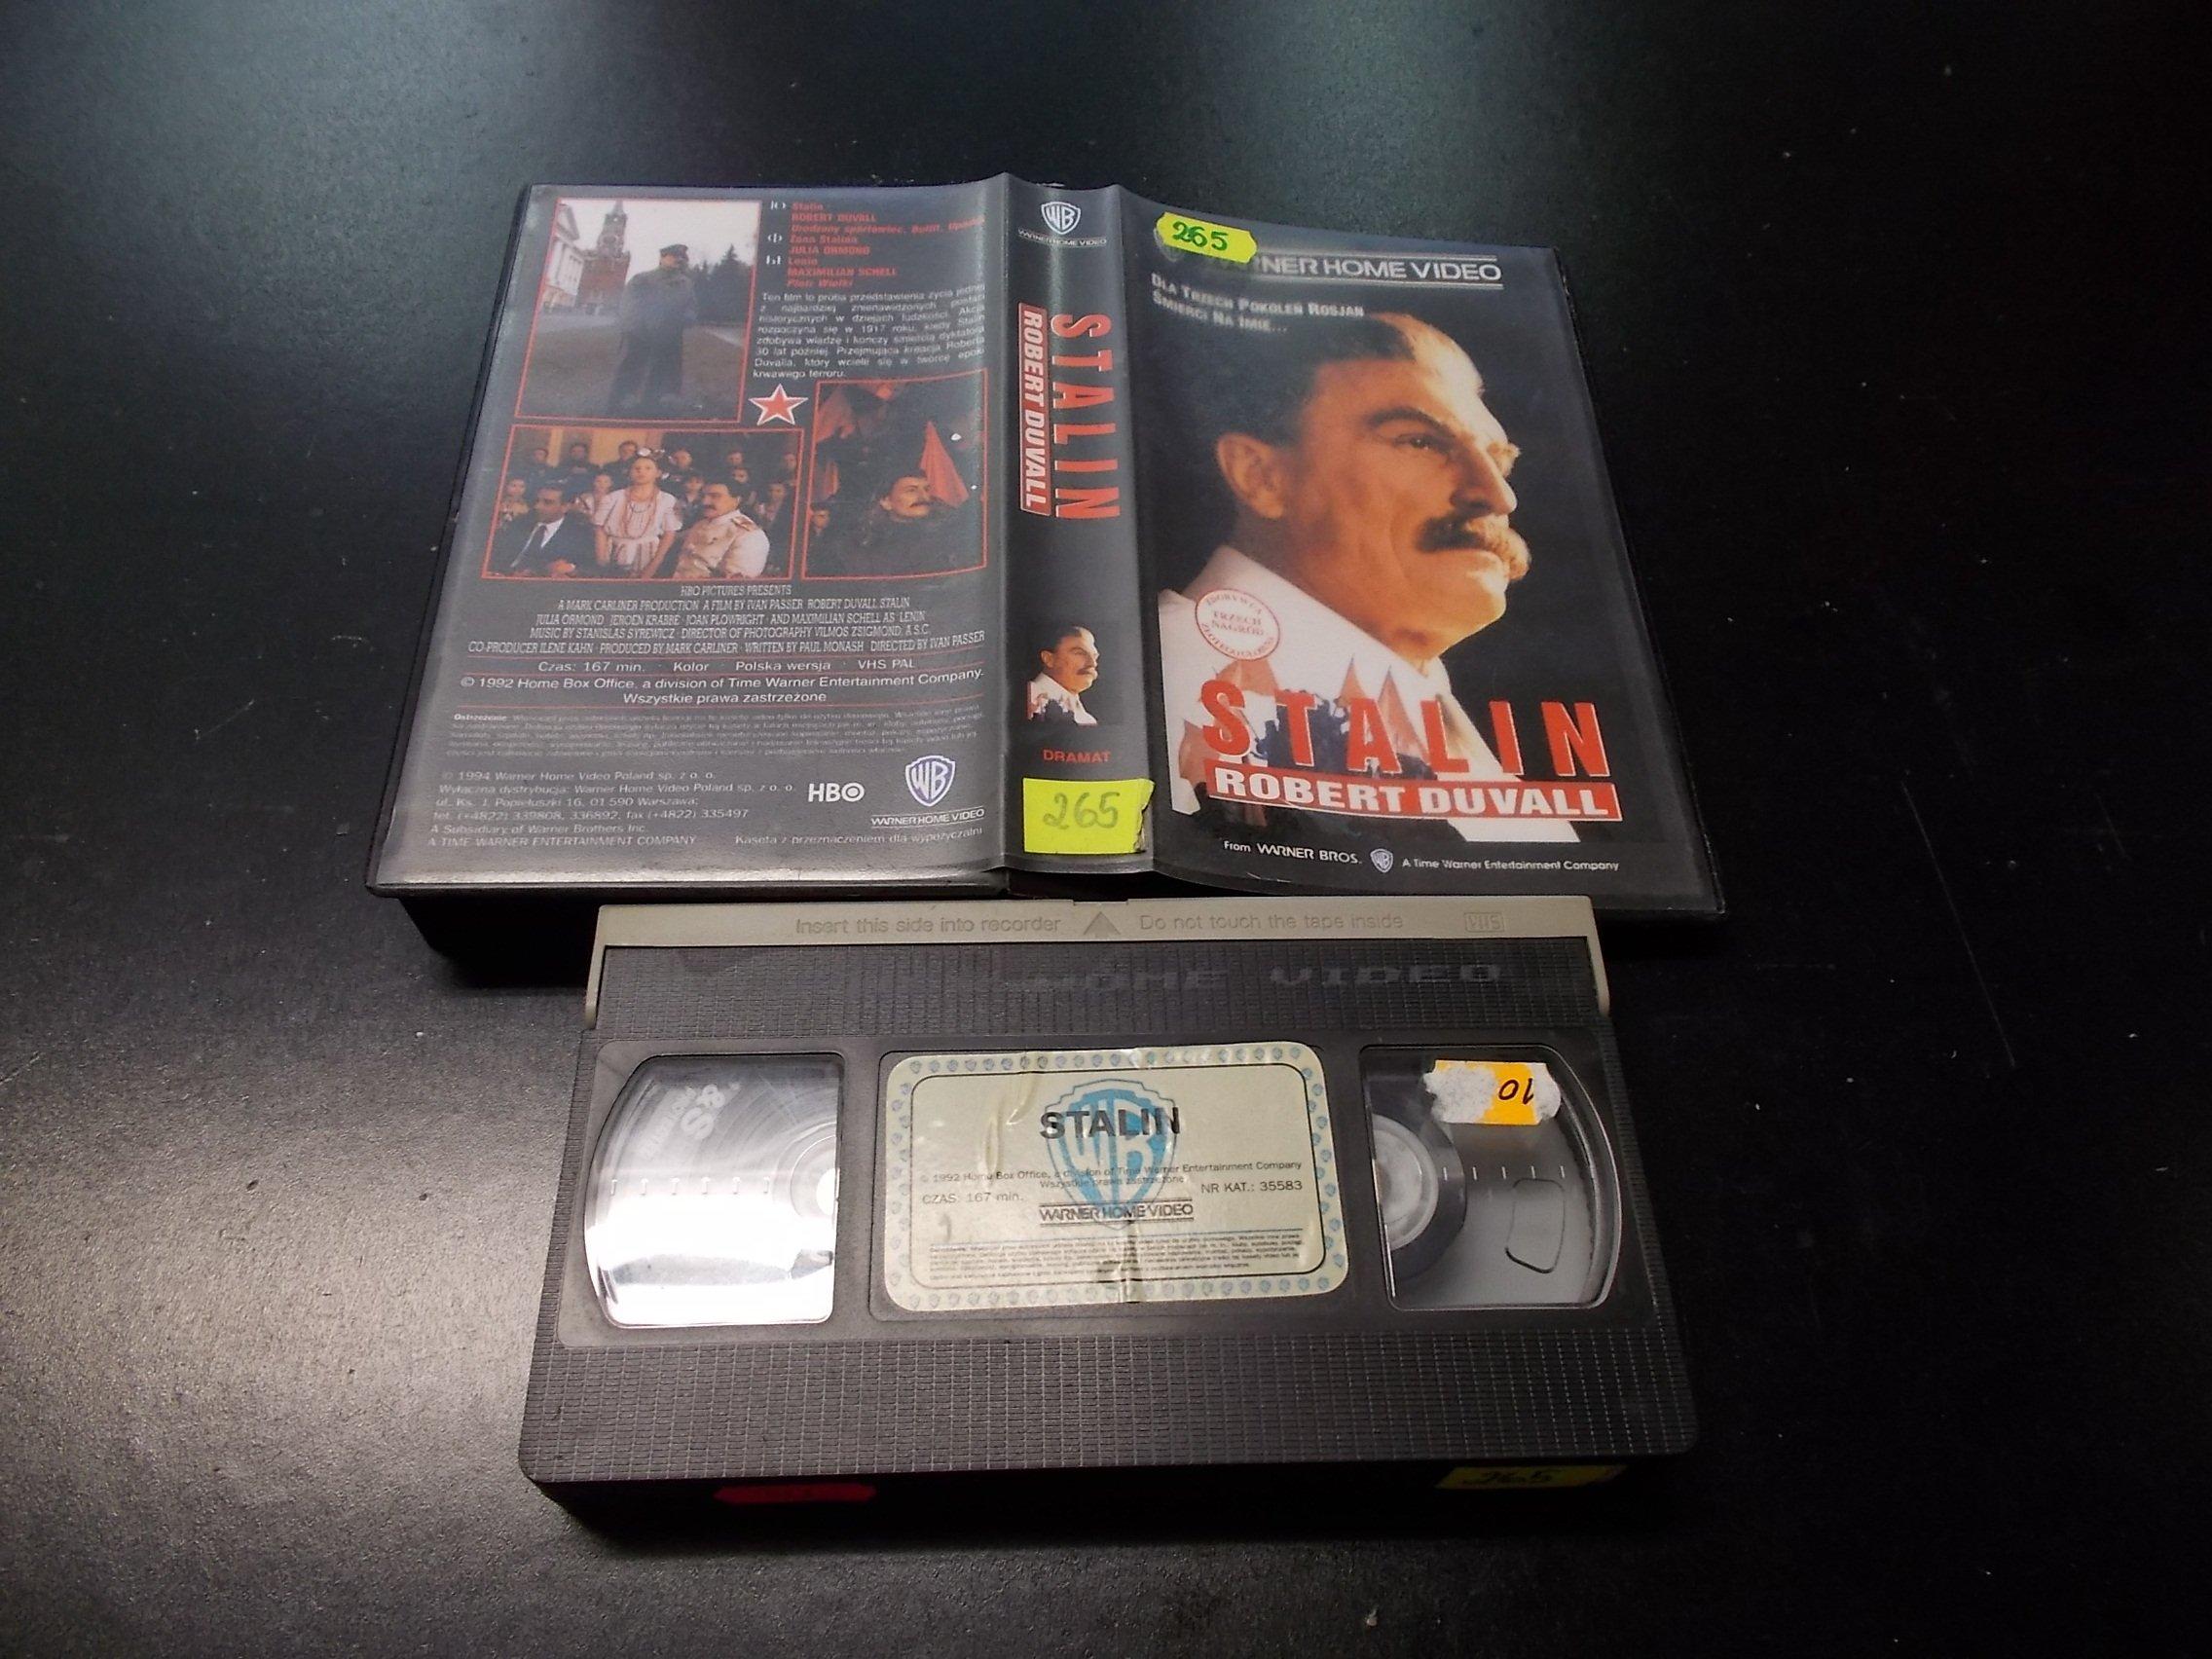 STALIN - ROBERT DUVALL -  kaseta VHS - 1283 Opole - AlleOpole.pl